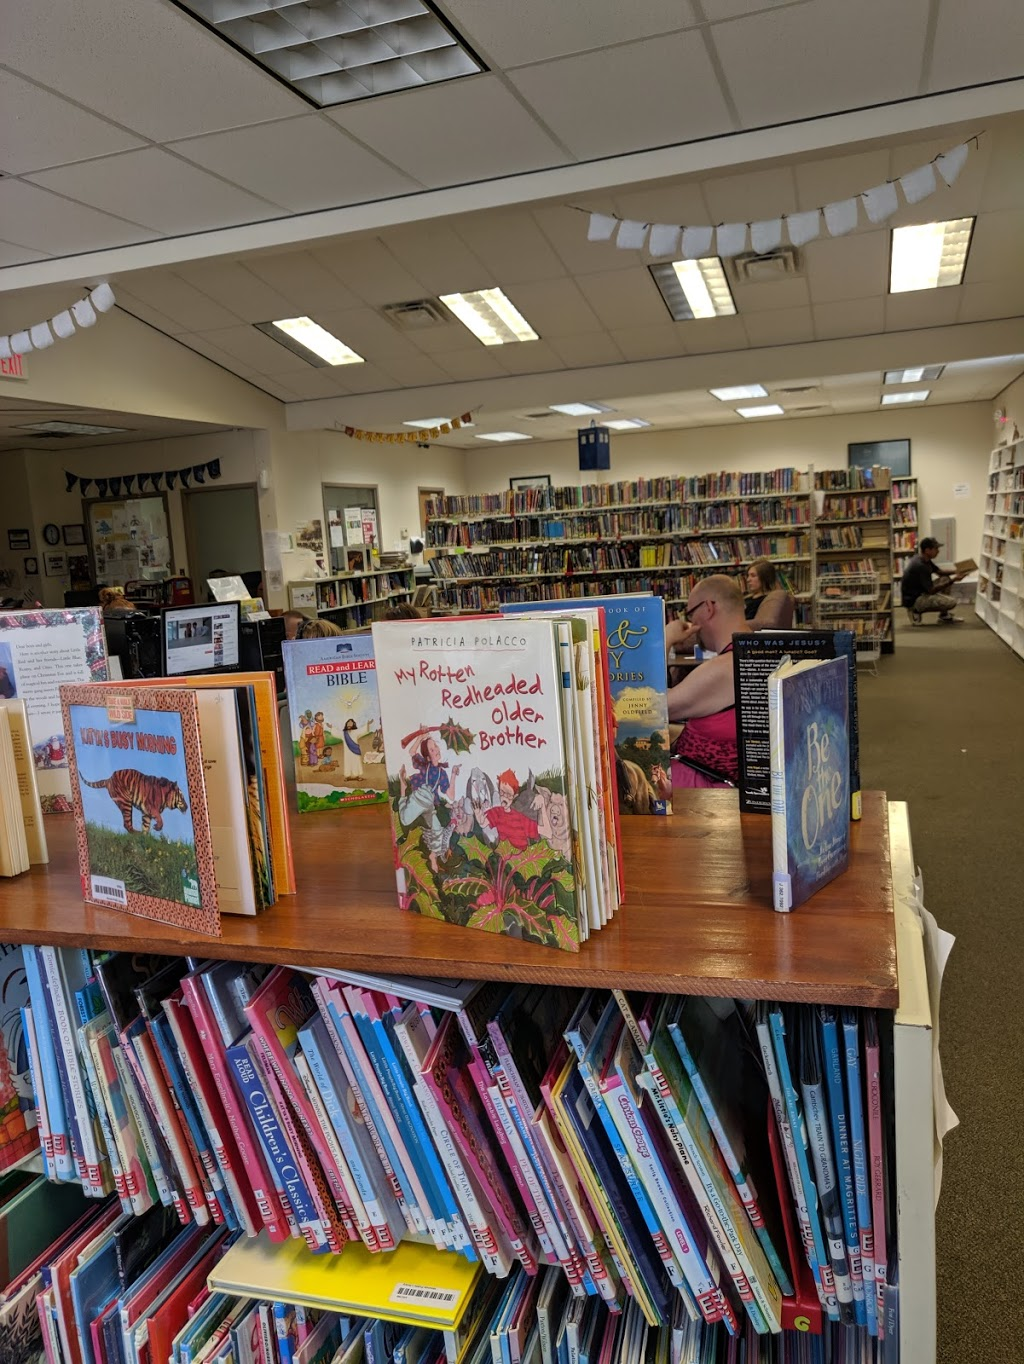 Mounds City Public Library - library  | Photo 3 of 3 | Address: 14 14th St, Mounds, OK 74047, USA | Phone: (918) 827-3949